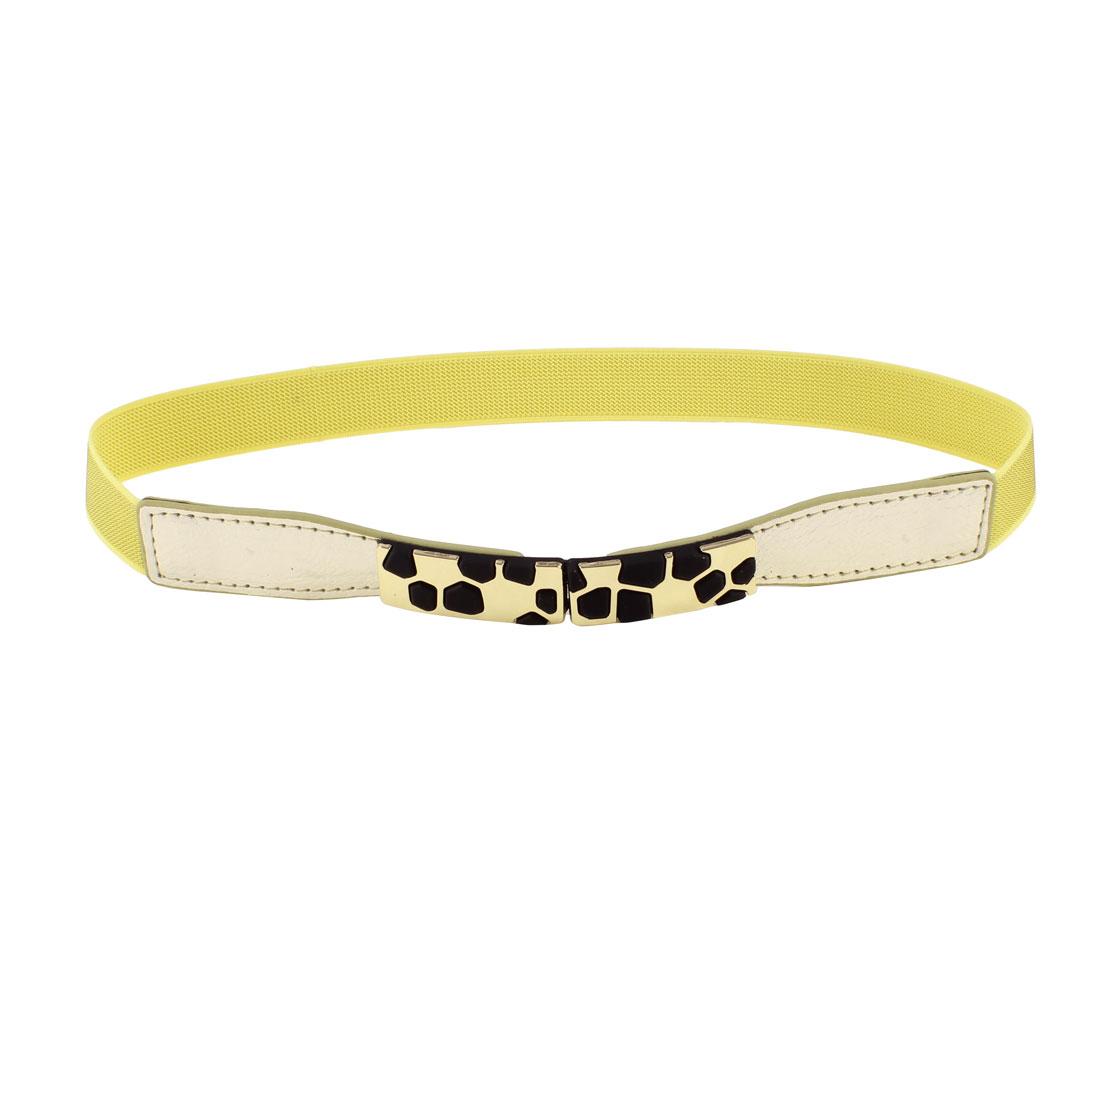 Block Design Metal Interlocking Buckle Stretchy Waist Belt Yellow for Ladies